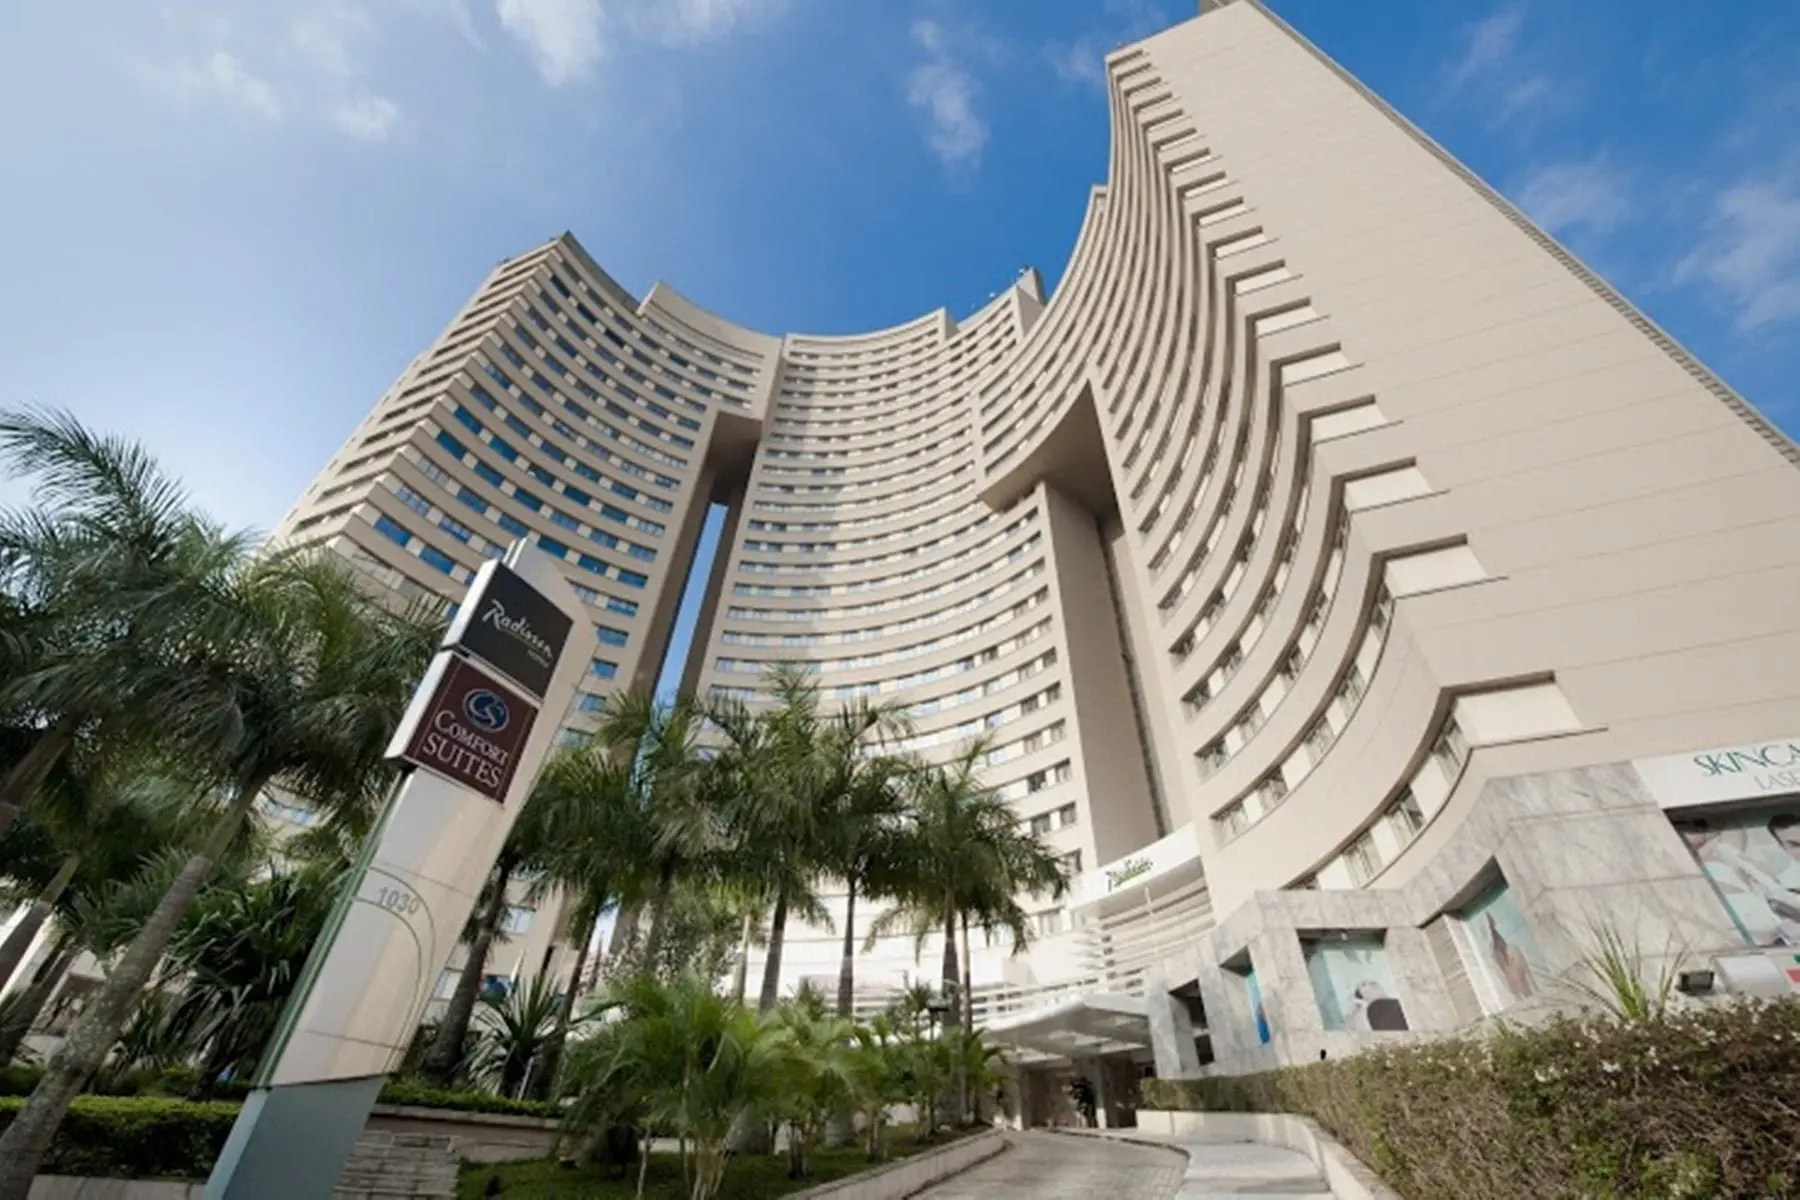 Hotelaria de Alphaville oferece tarifas especiais para feriados de novembro